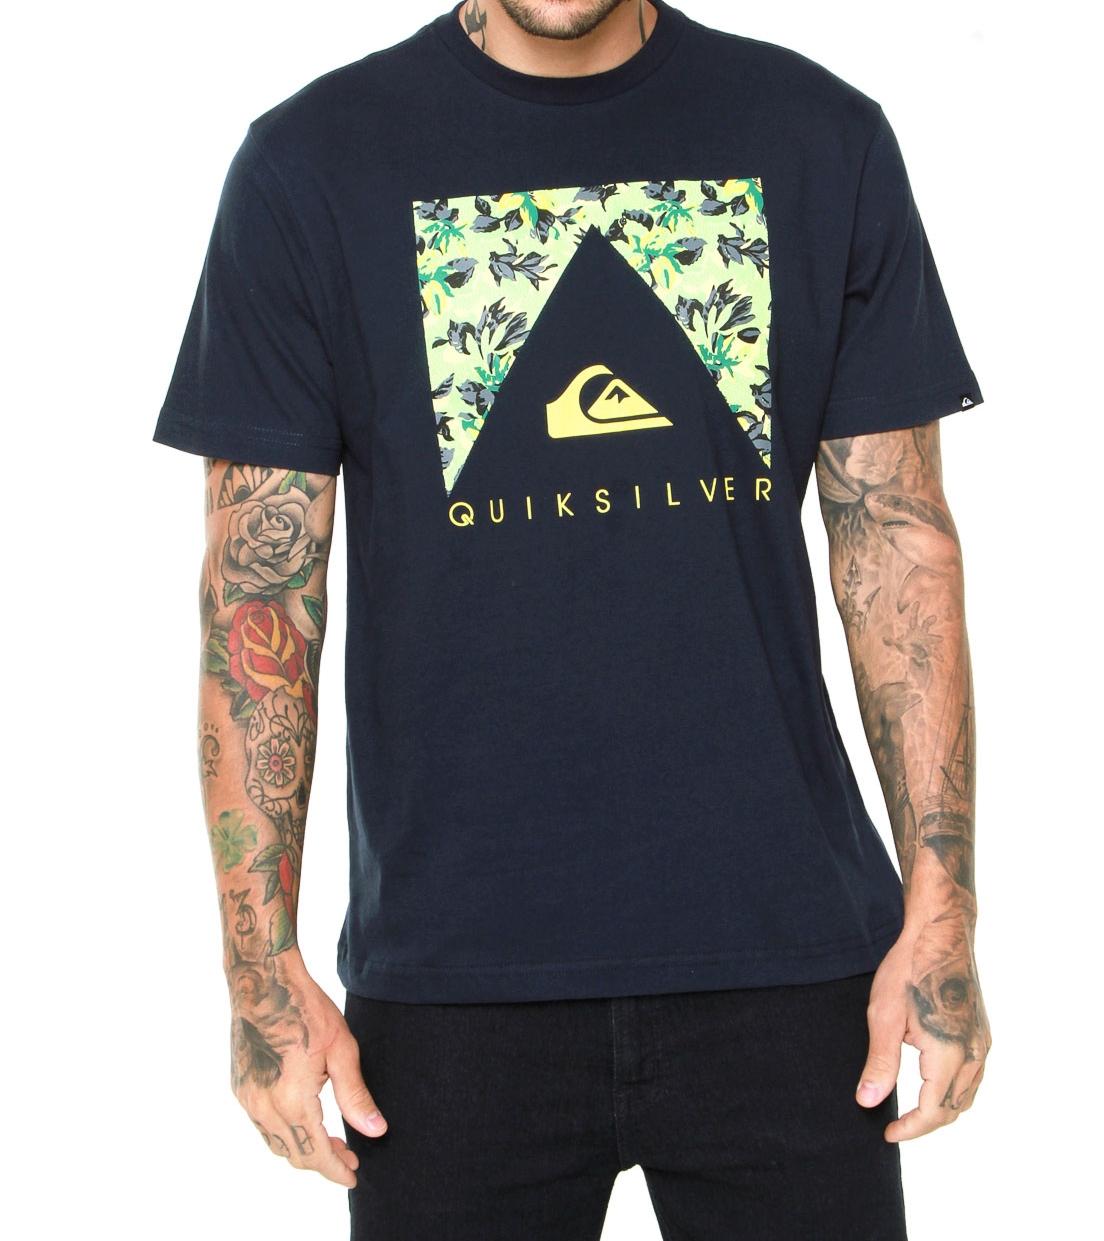 188ebca04a1c1 Camisetas Quiksilver no Atacado - Kits de 03 a 50 peças - Roupas de ...